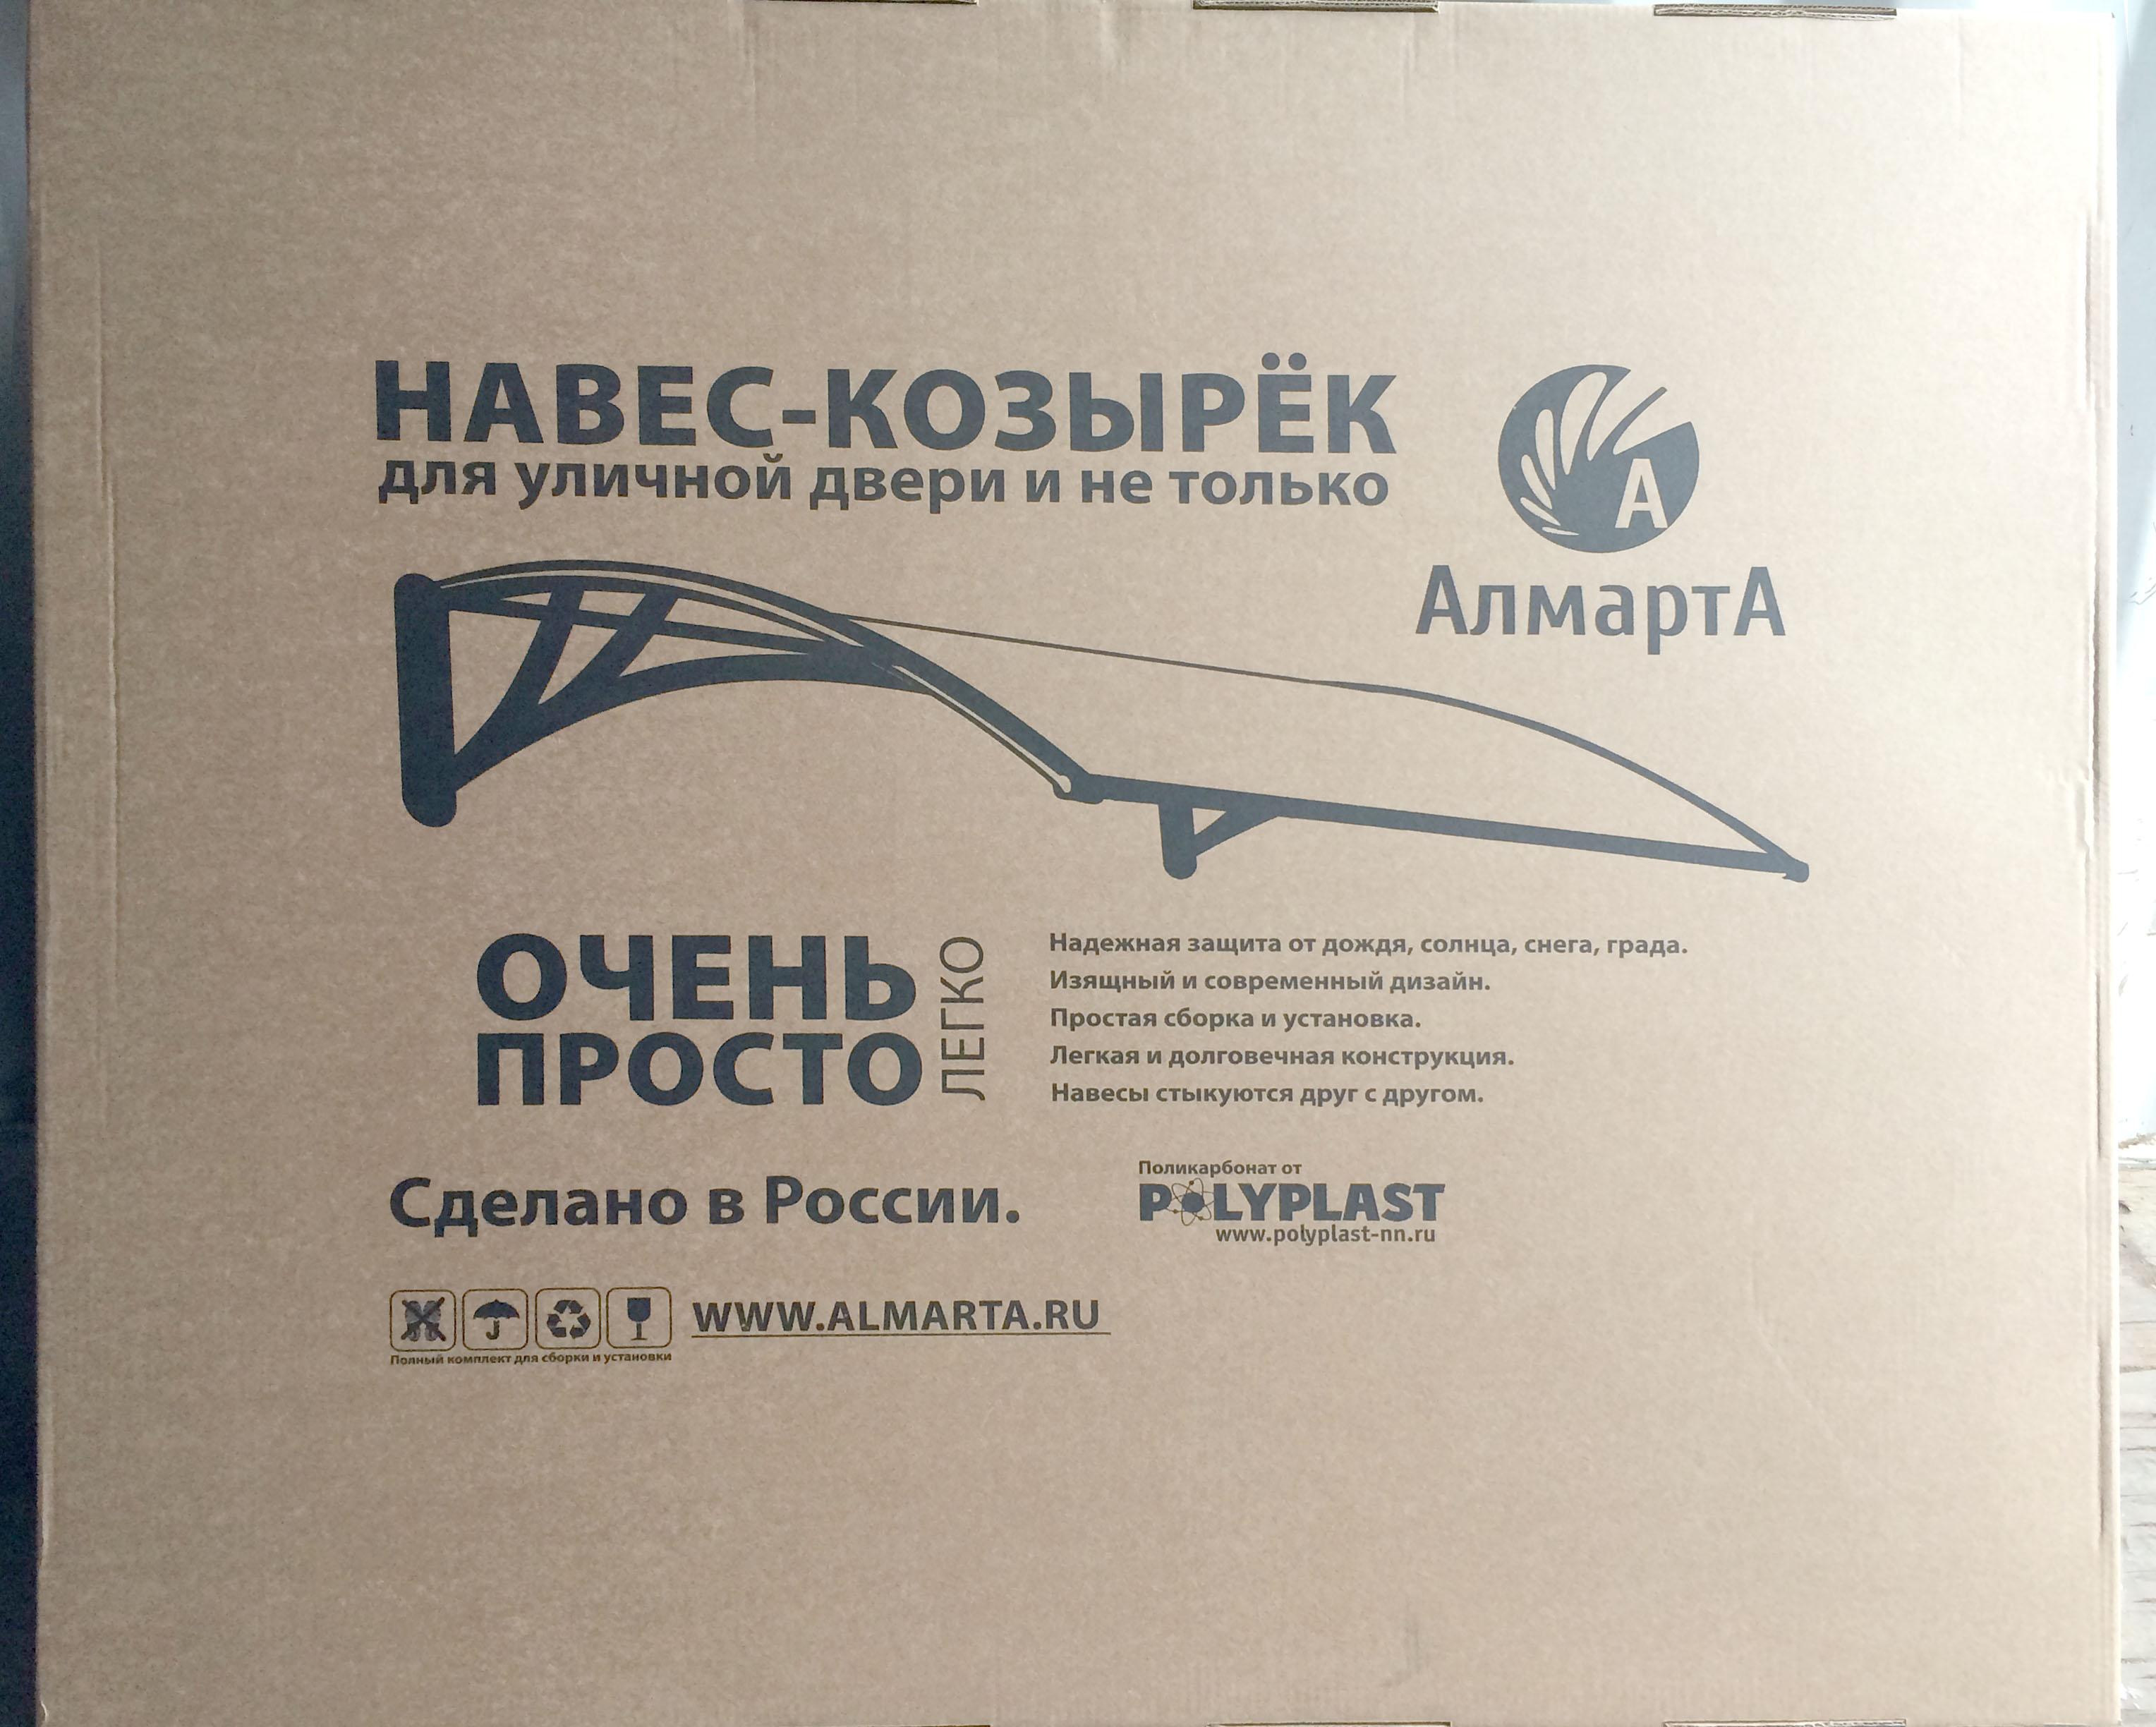 Козырек Алмарта коробка